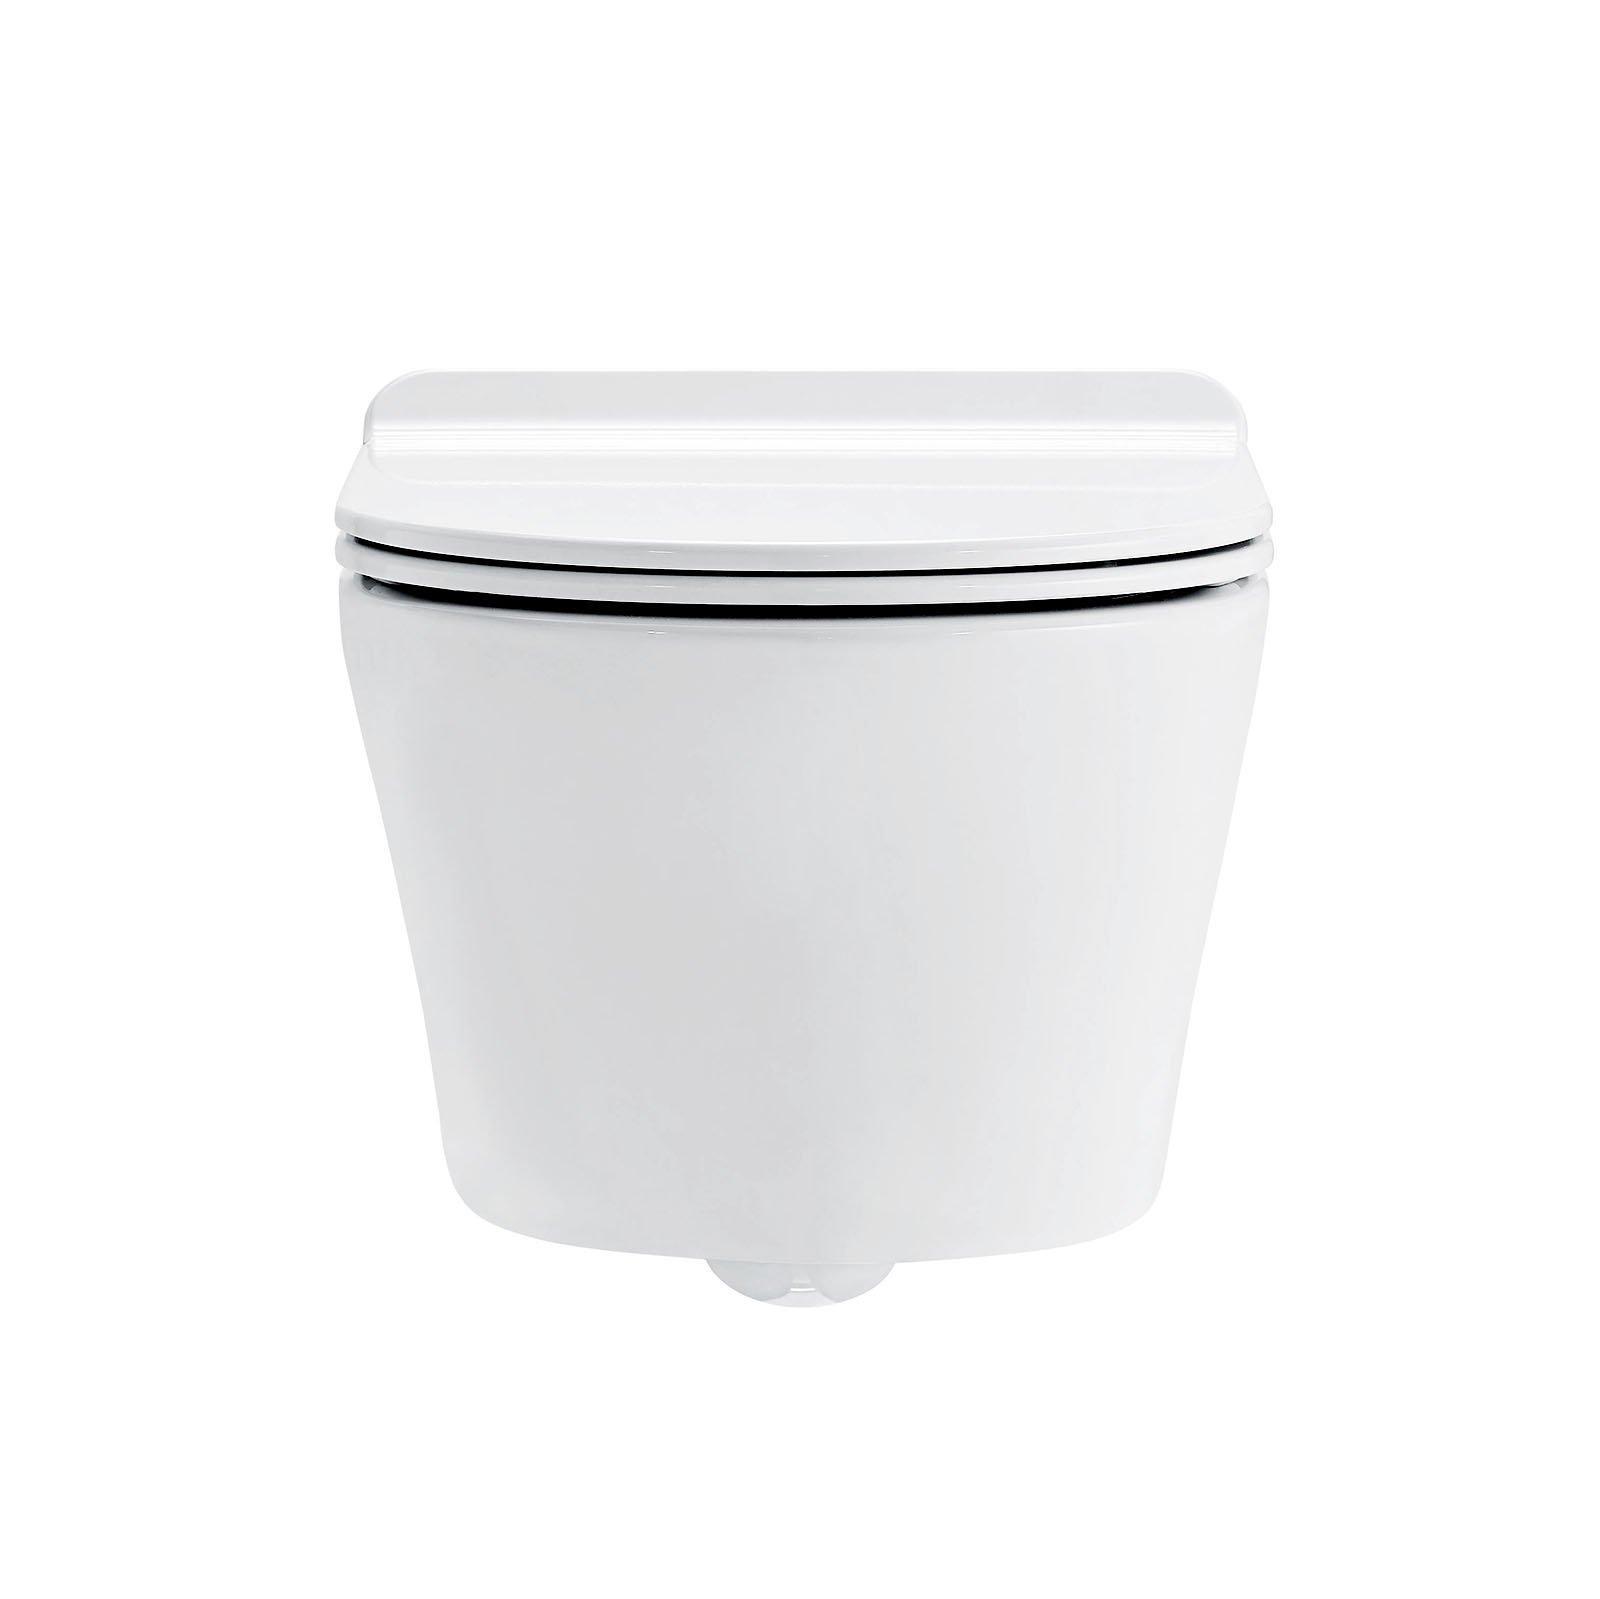 BERNSTEIN Wand-Hänge-WC Toilette CH1088 - inkl. WC-Deckel Softclose flach zoom thumbnail 3